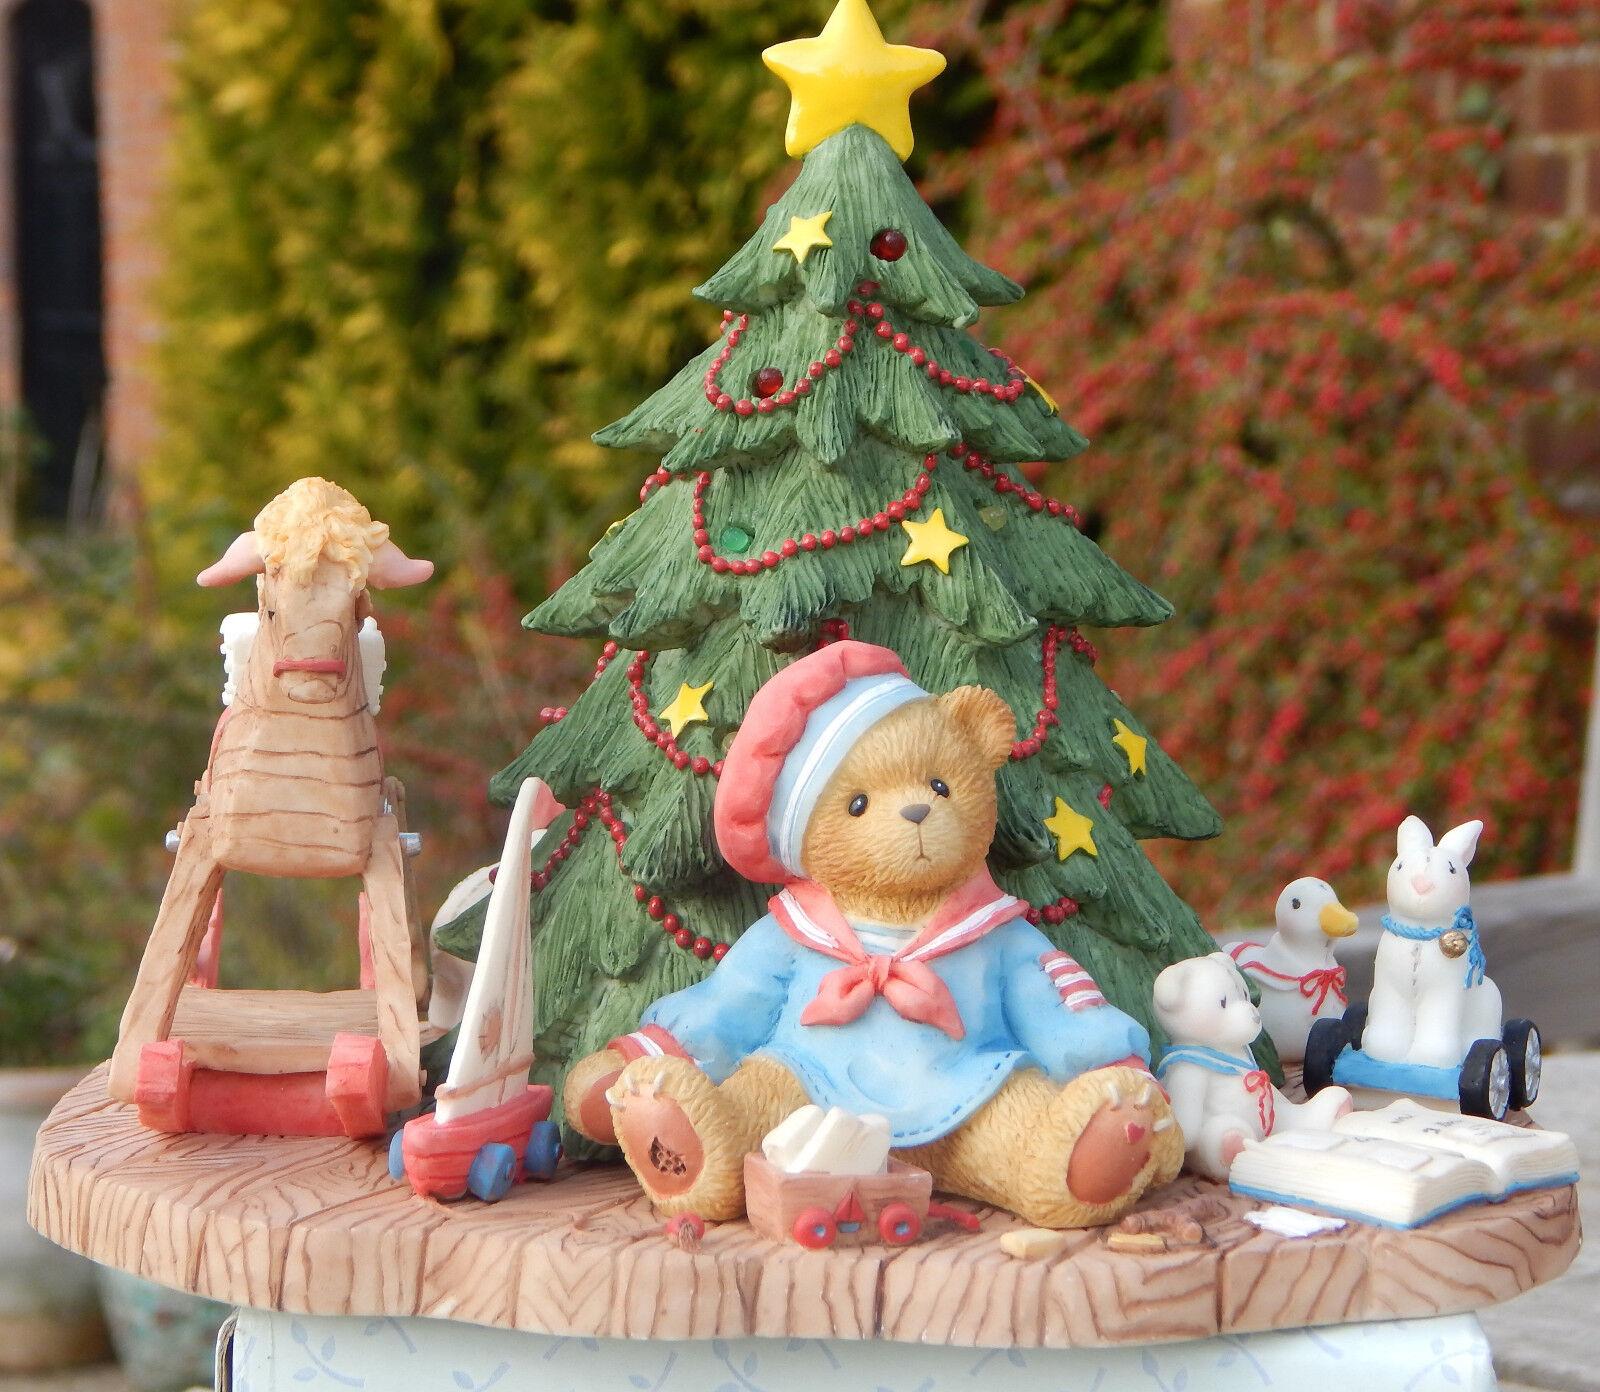 Cherished Teddies - Graham - Ltd Ltd Ltd Edition - Christmas - New In Box eada38